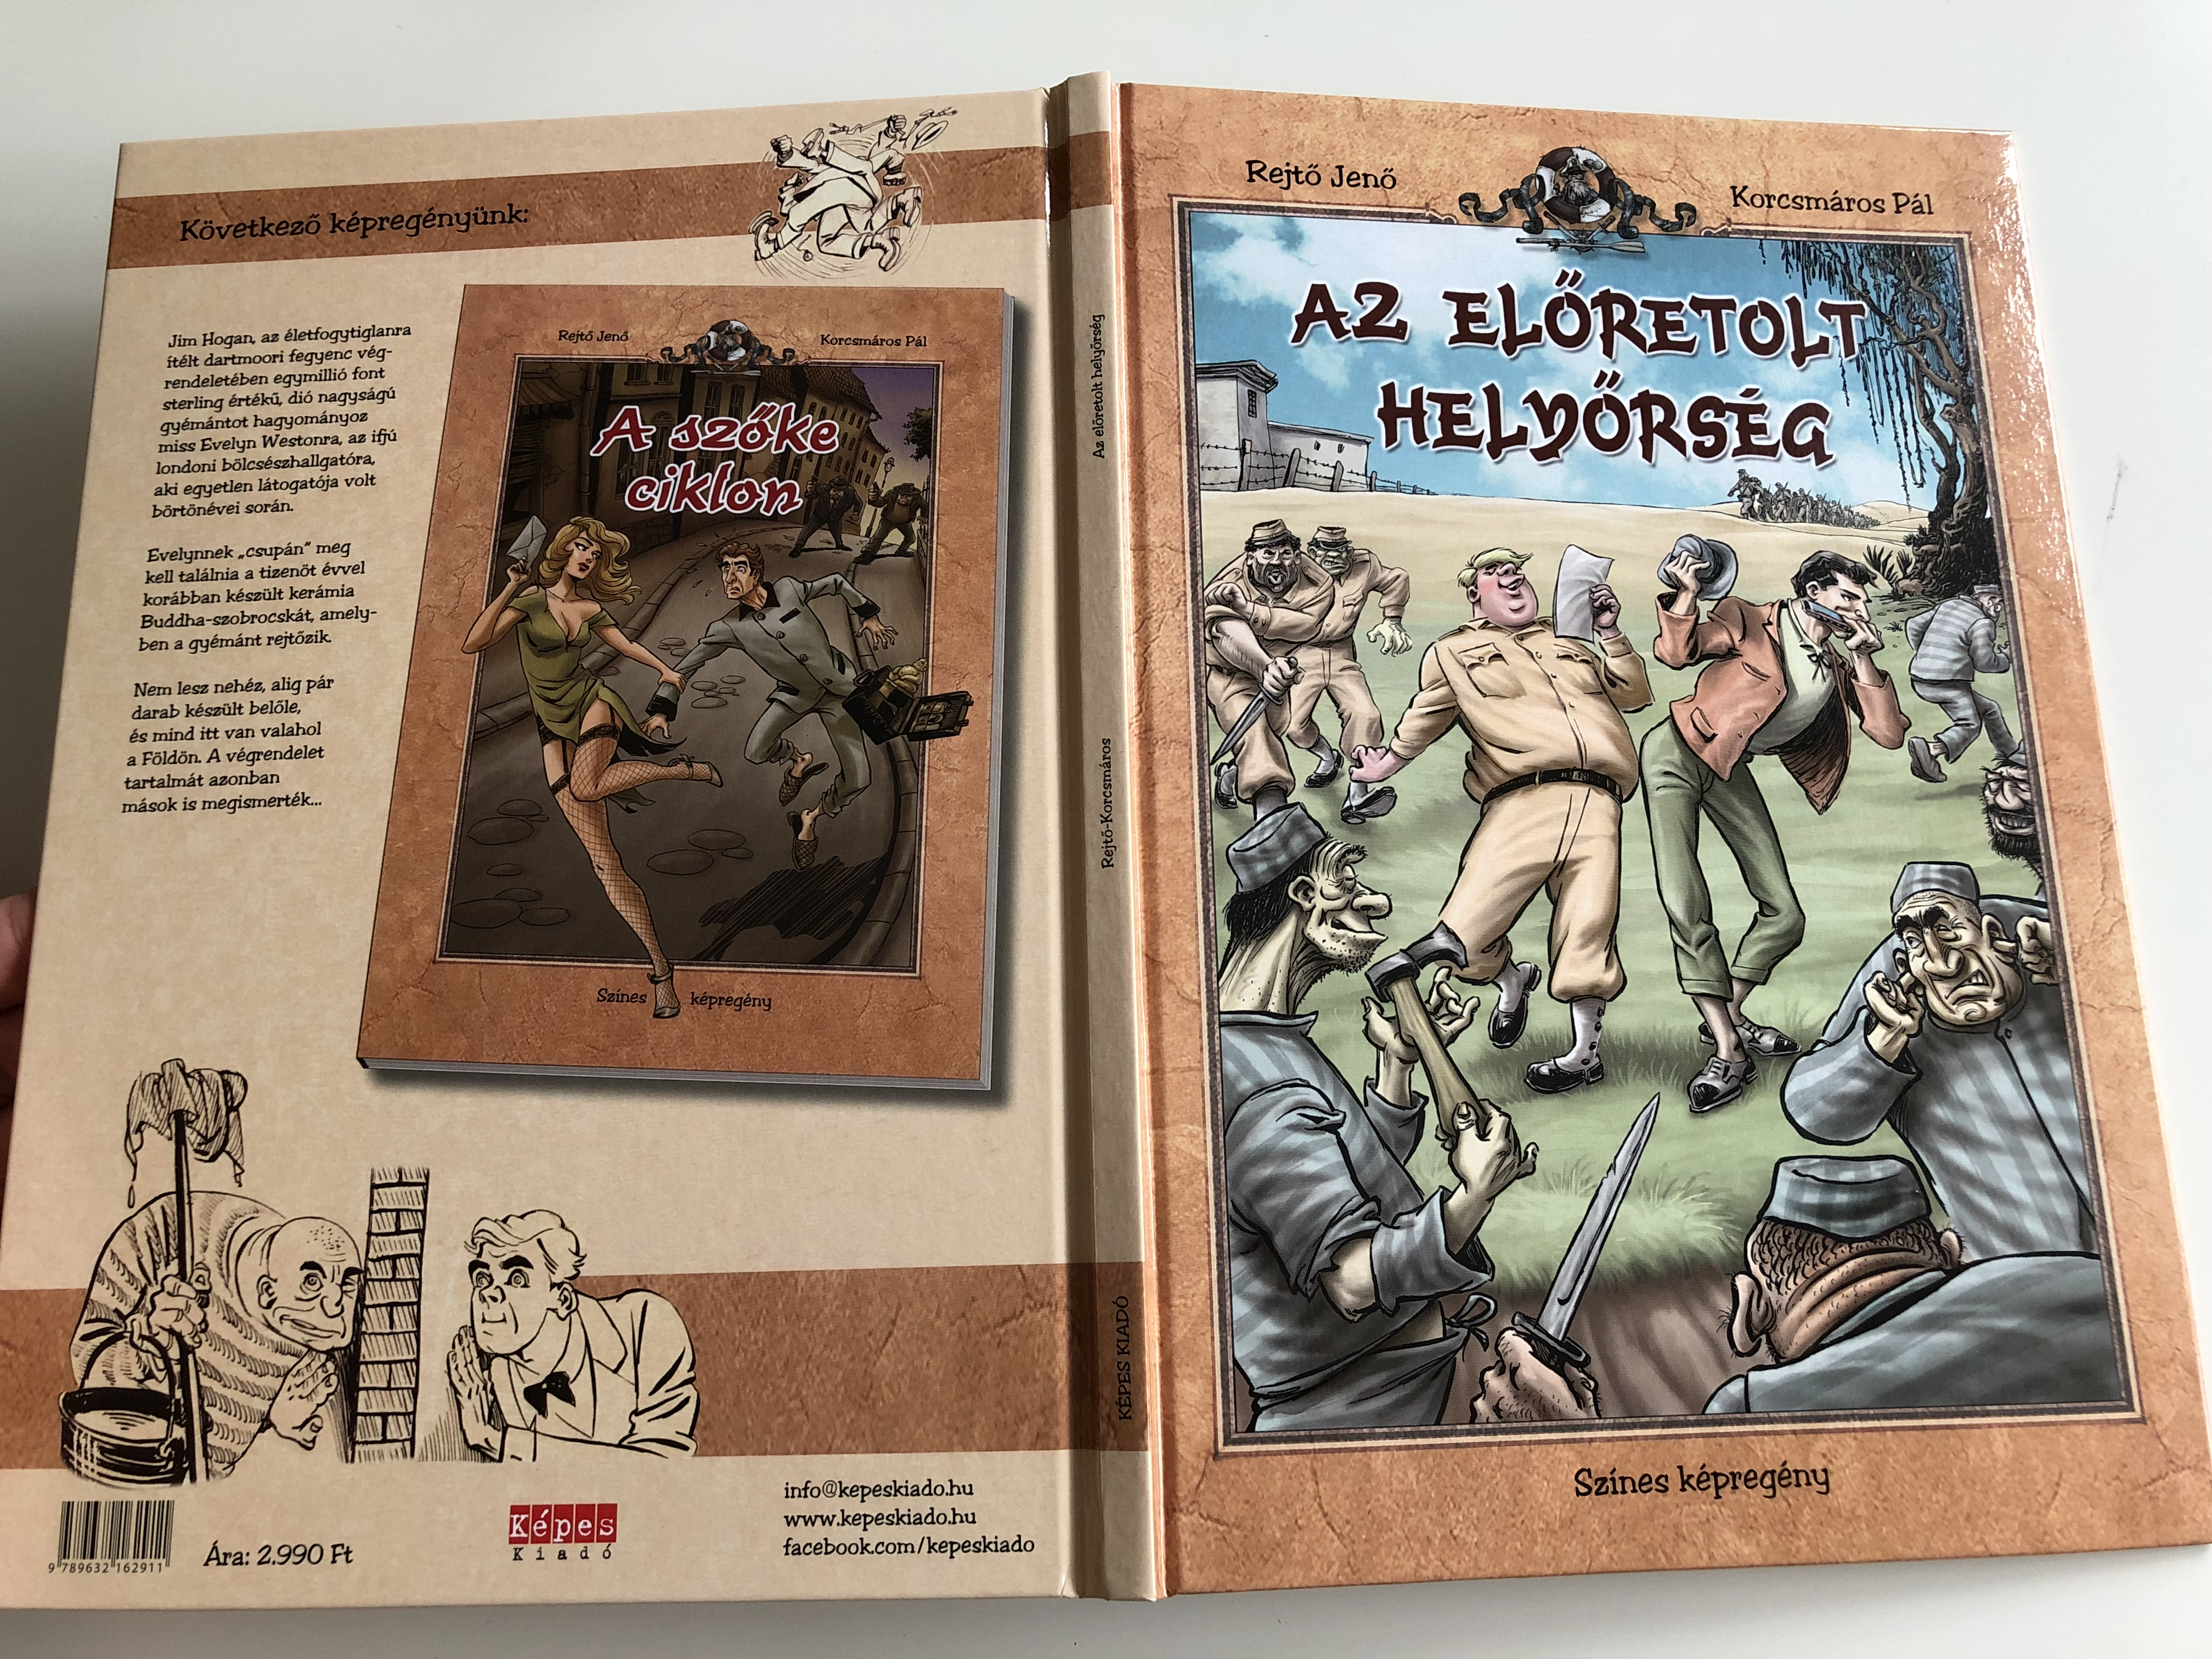 az-el-tretolt-hely-rs-g-by-rejt-jen-korcsm-ros-p-l-sz-nes-k-preg-ny-the-frontier-garrison-color-comic-book-hardcover-2013-3rd-edition-k-pes-kiad-13-.jpg